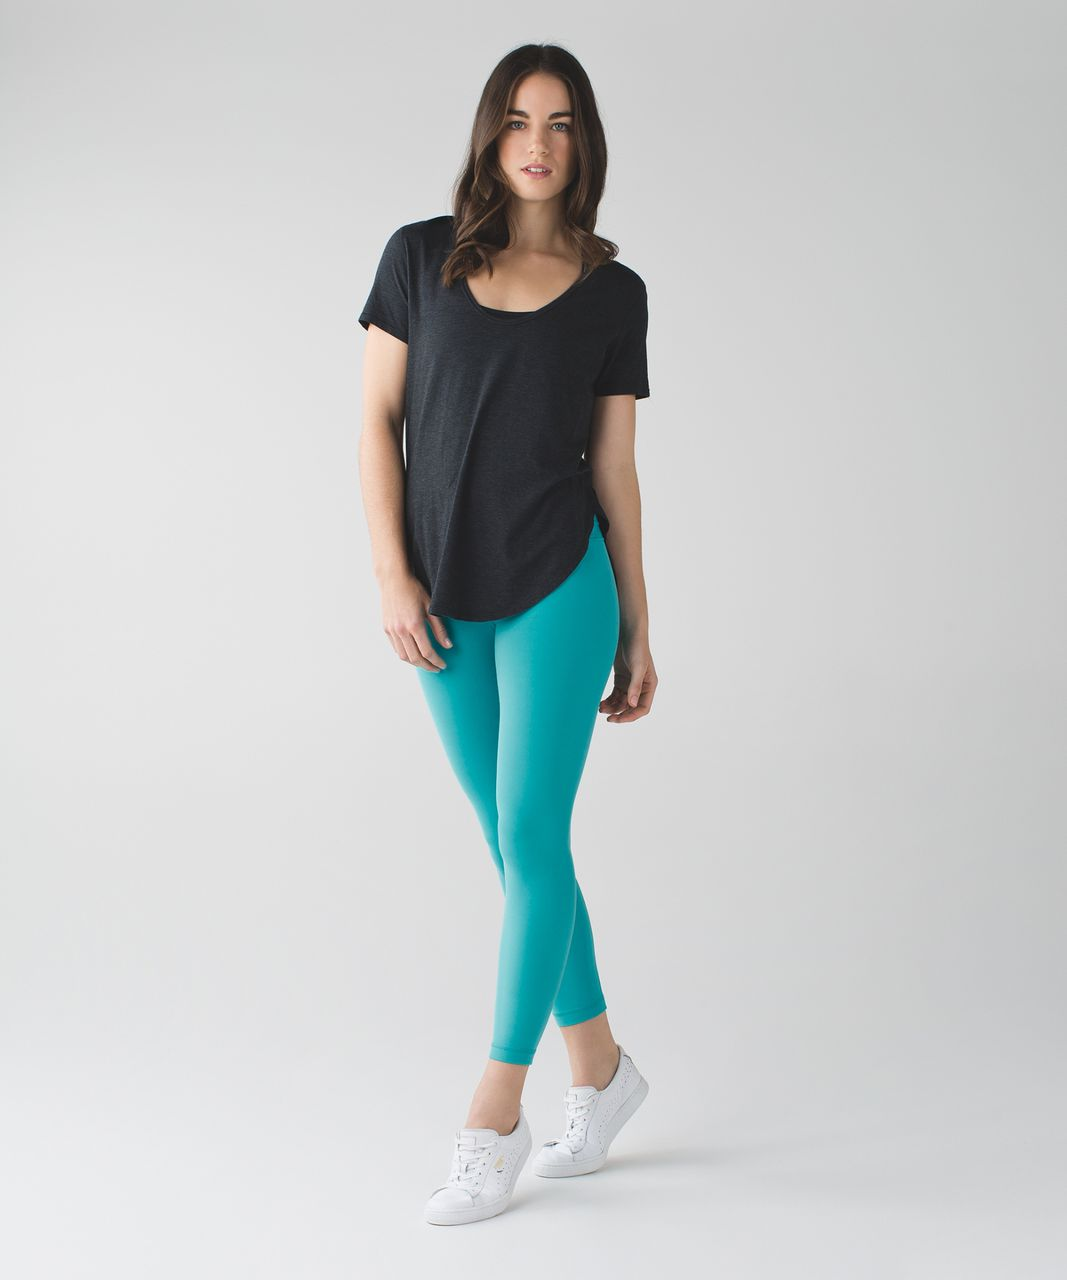 Lululemon Align Pant - Peacock Blue